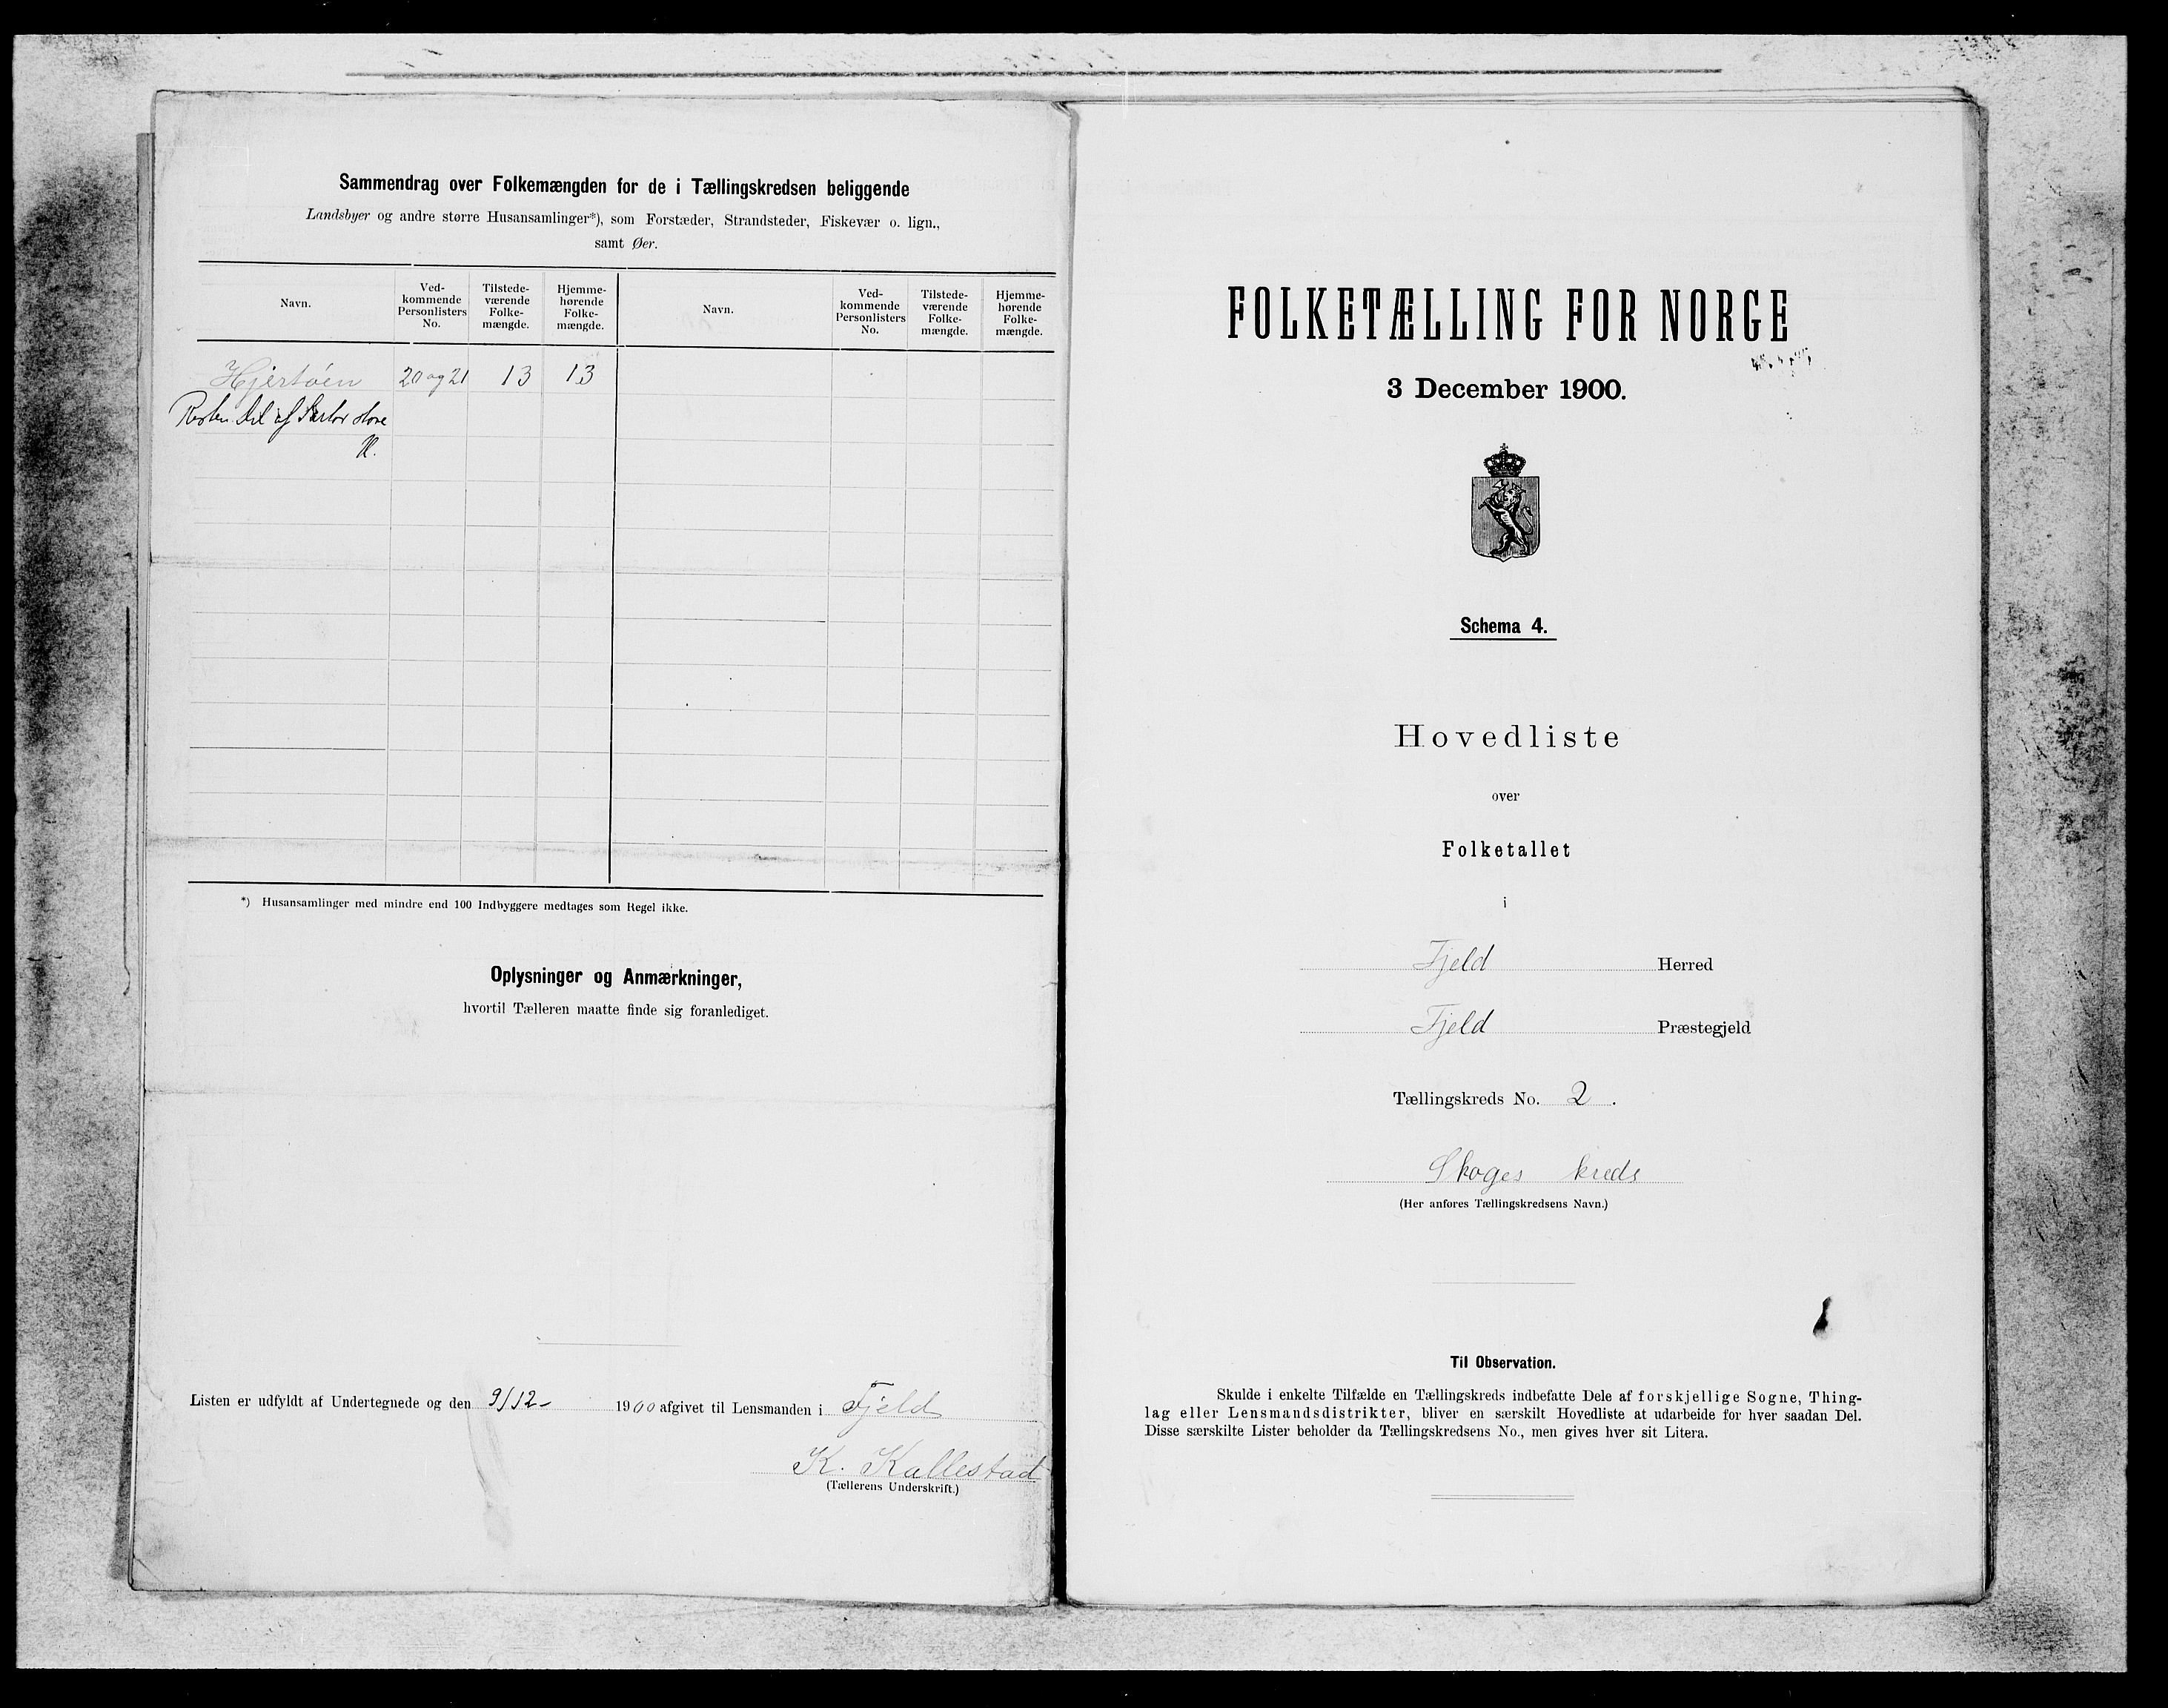 SAB, Folketelling 1900 for 1246 Fjell herred, 1900, s. 3